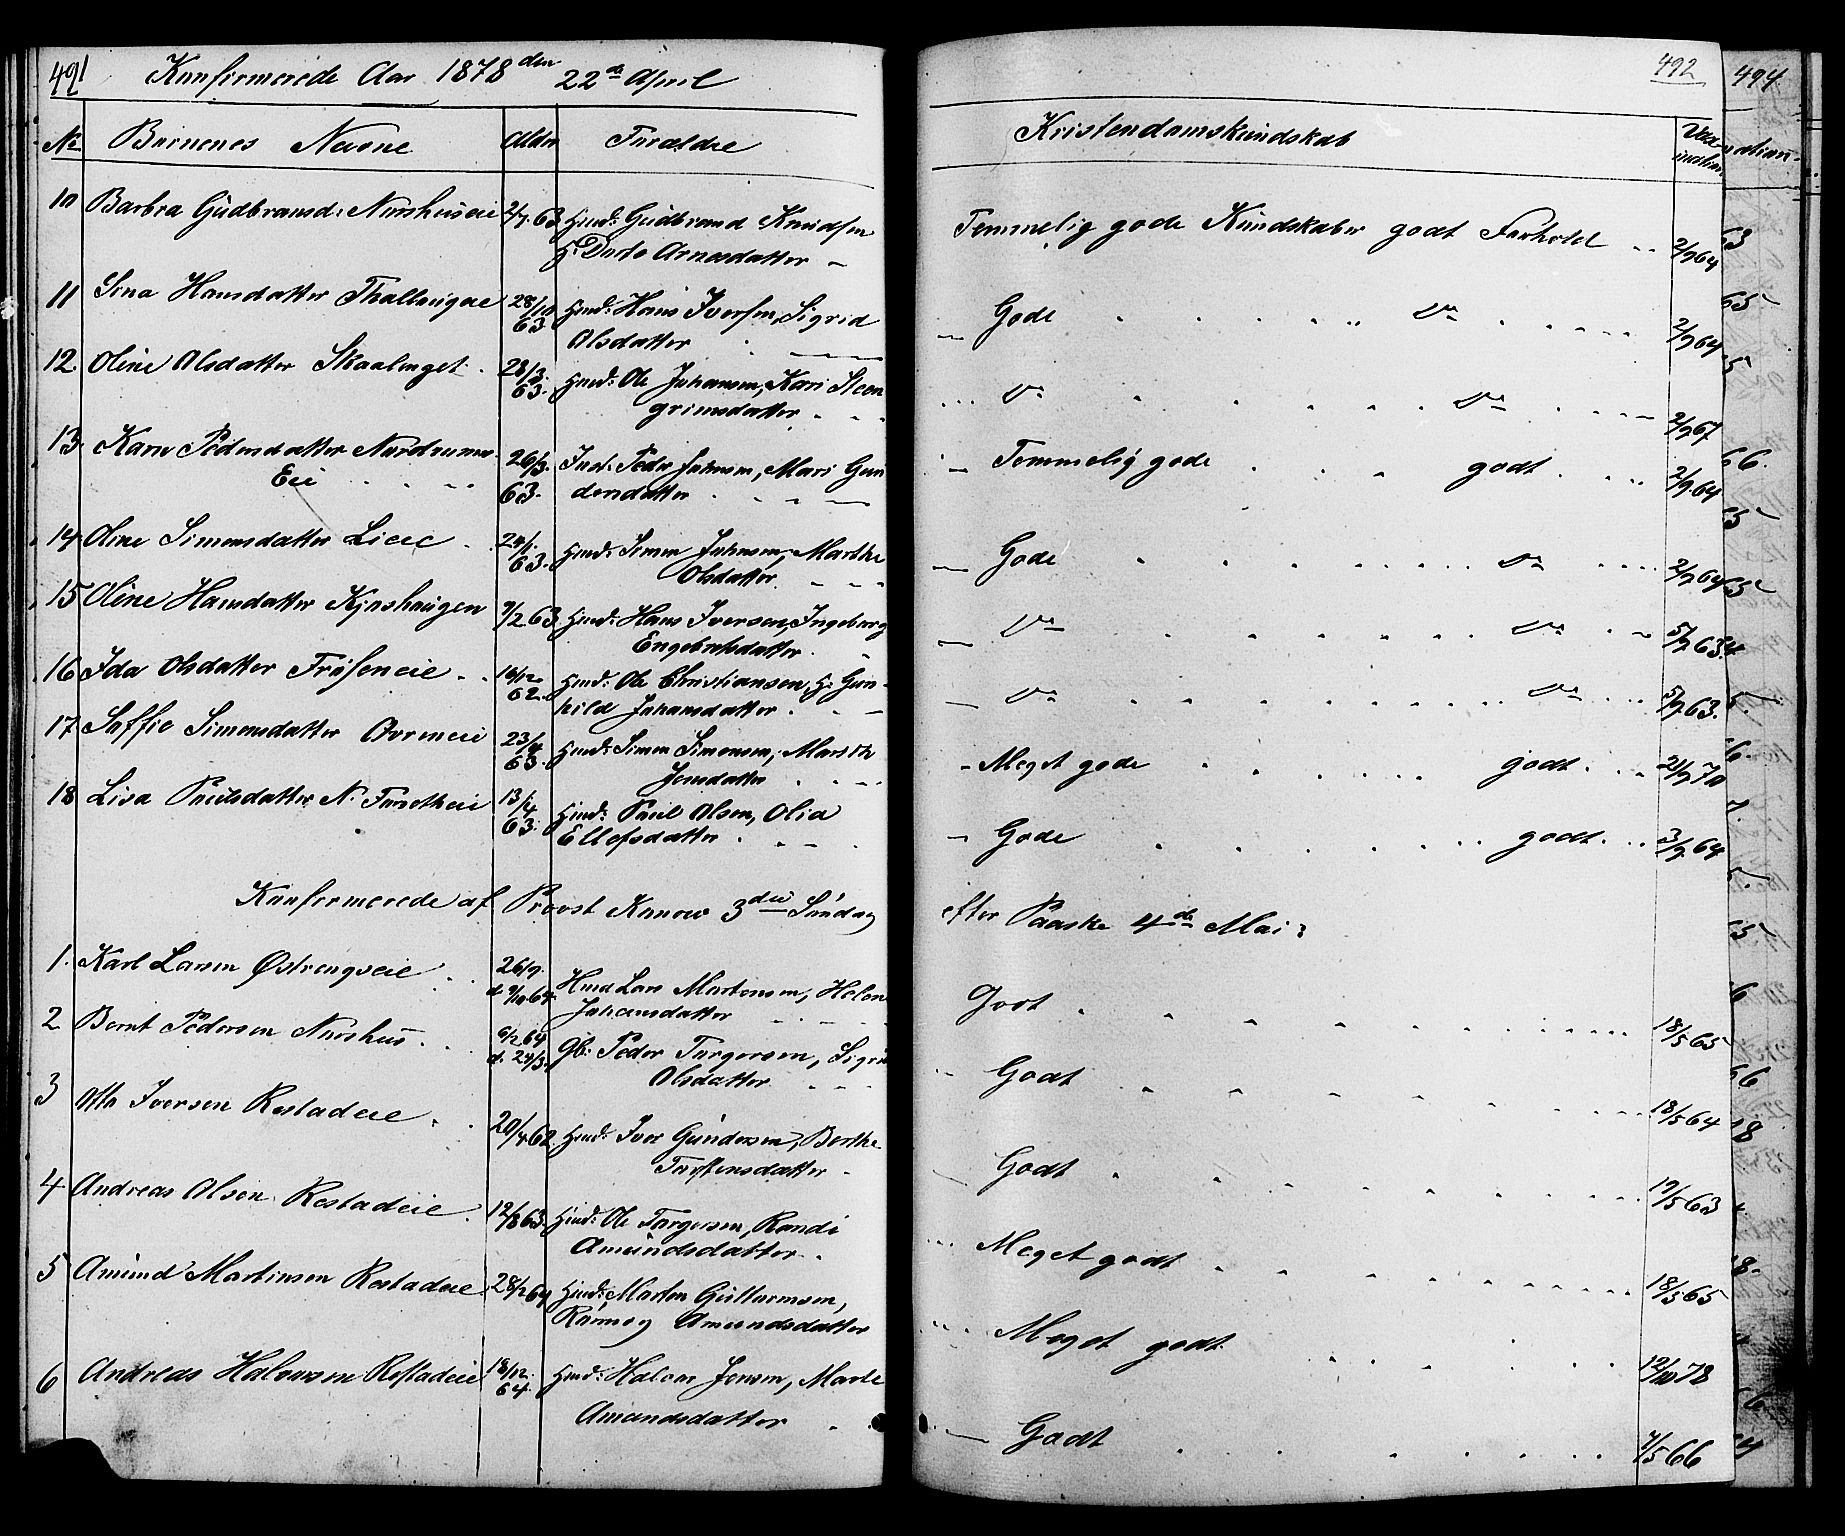 SAH, Østre Gausdal prestekontor, Klokkerbok nr. 1, 1863-1893, s. 491-492